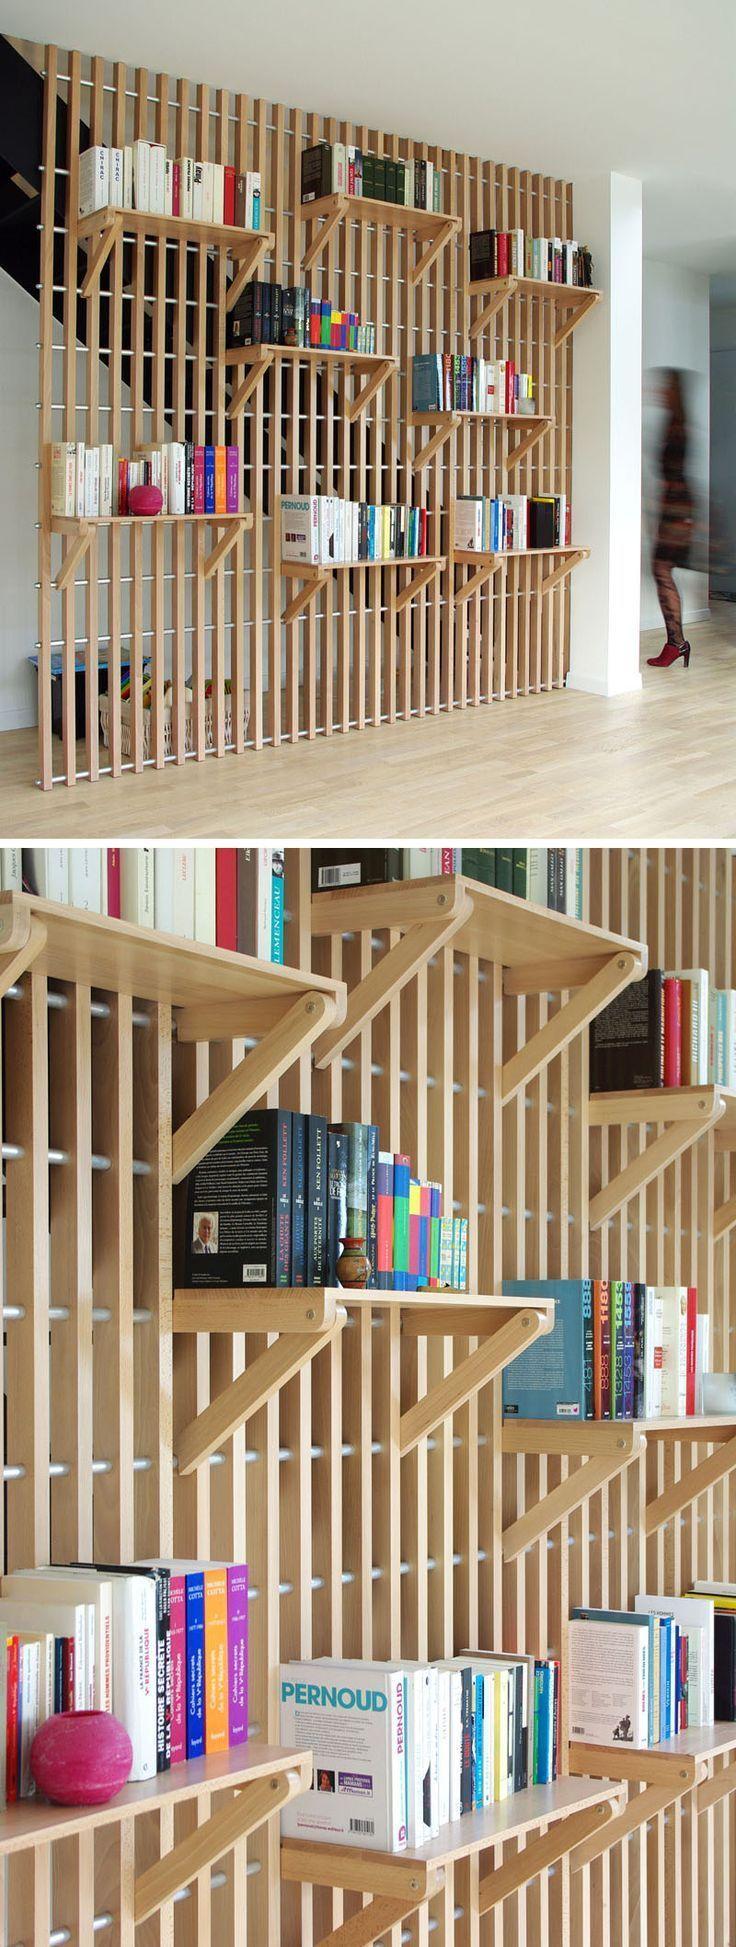 French designer Alexandre Pain created Rossignol, a custom designed wood shelf a